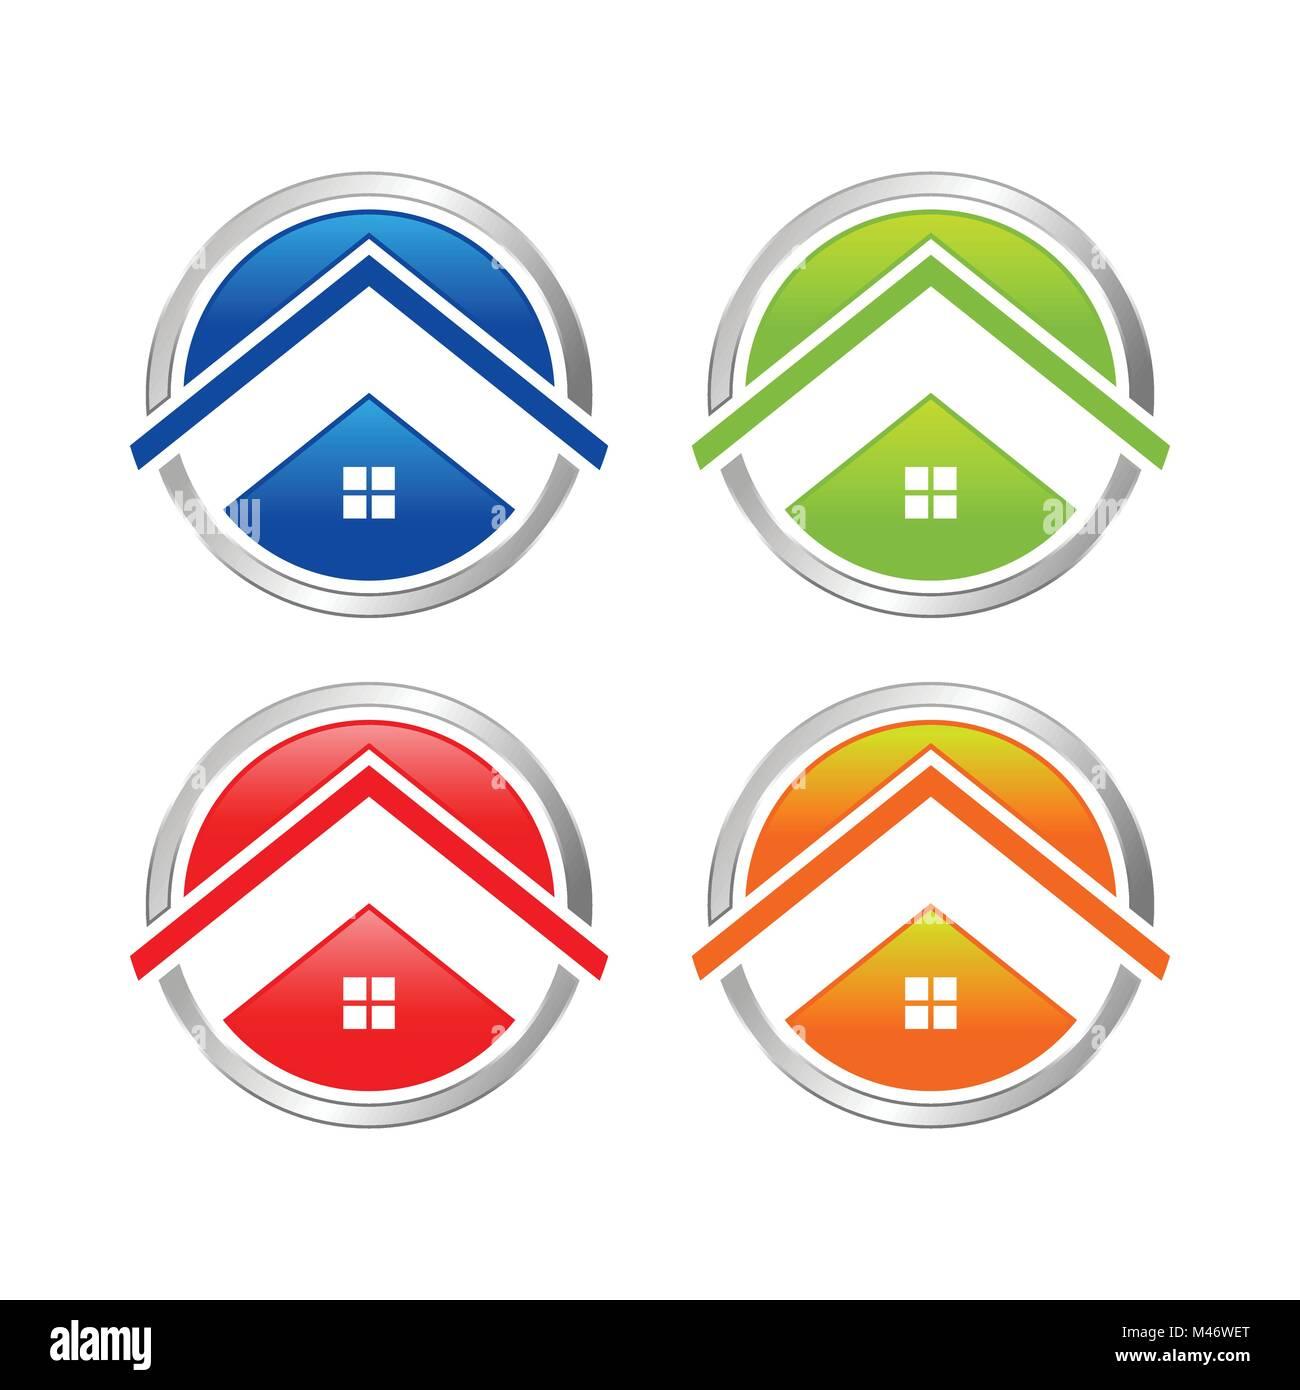 Abstract Multi Colored Home Circle Icon Vector Symbol Graphic Logo Design Set - Stock Vector